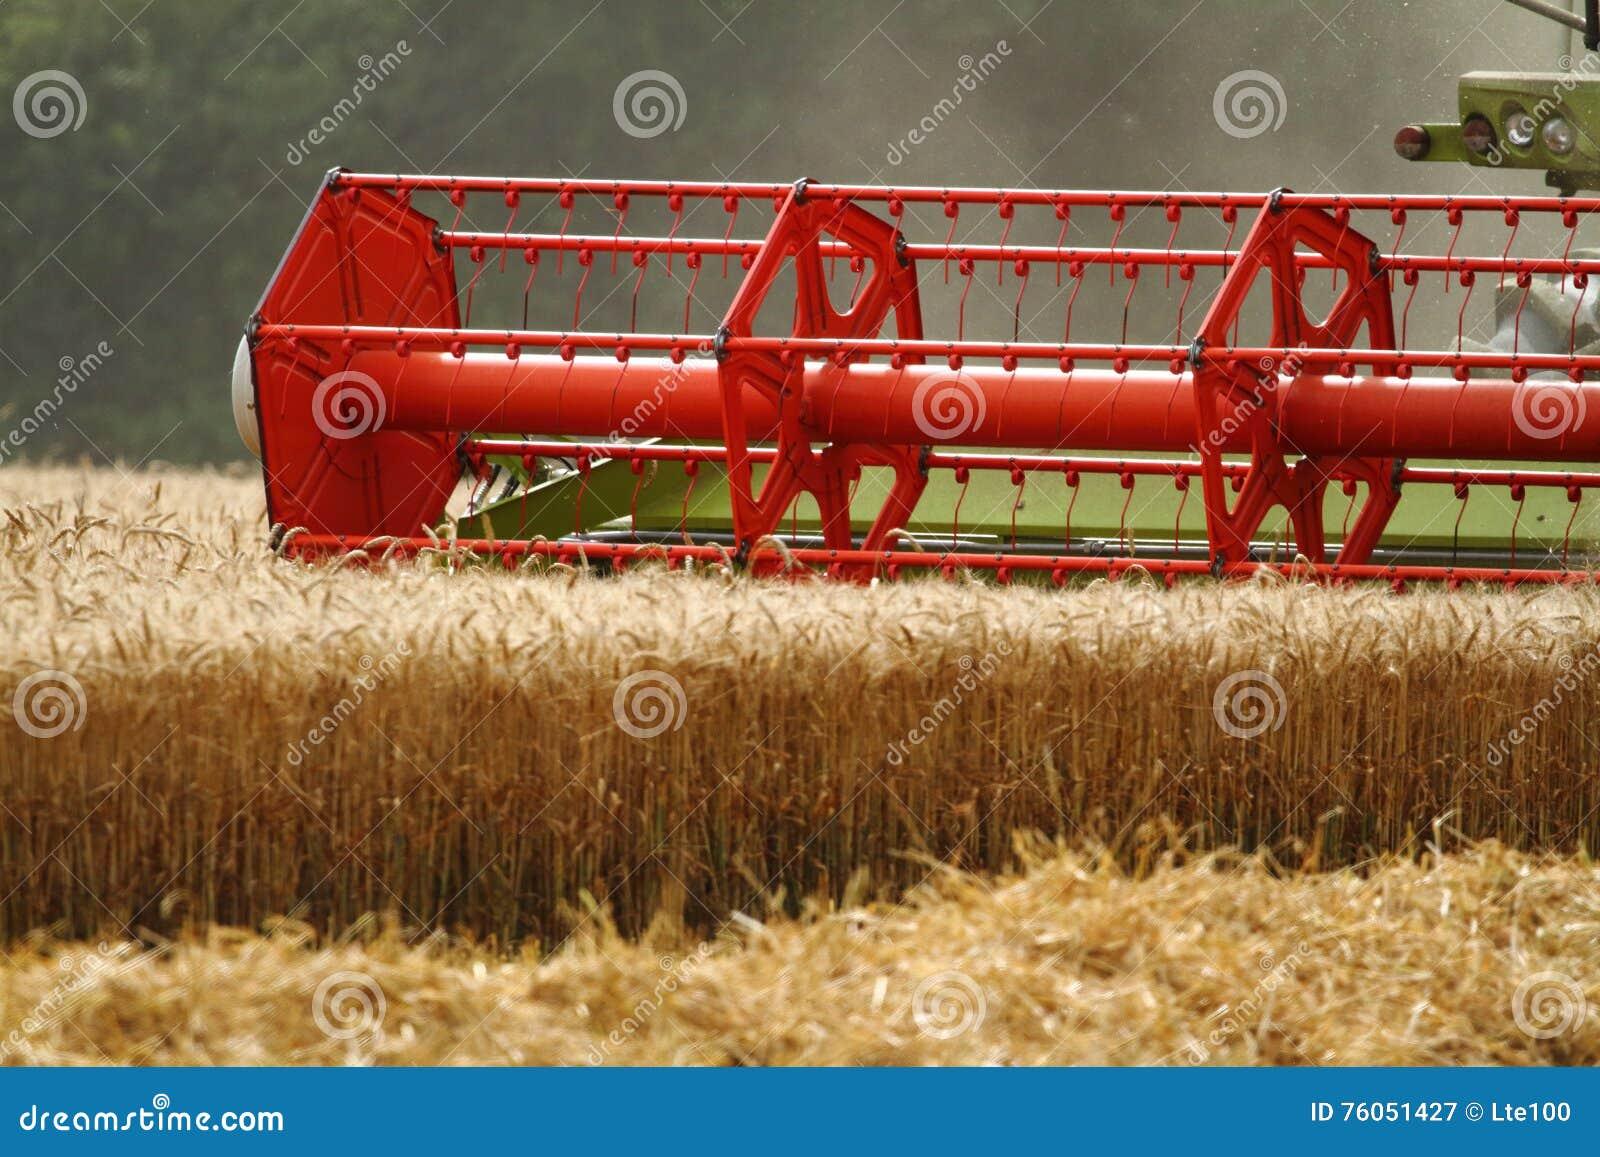 Barley harvest stock image  Image of machine, harvesting